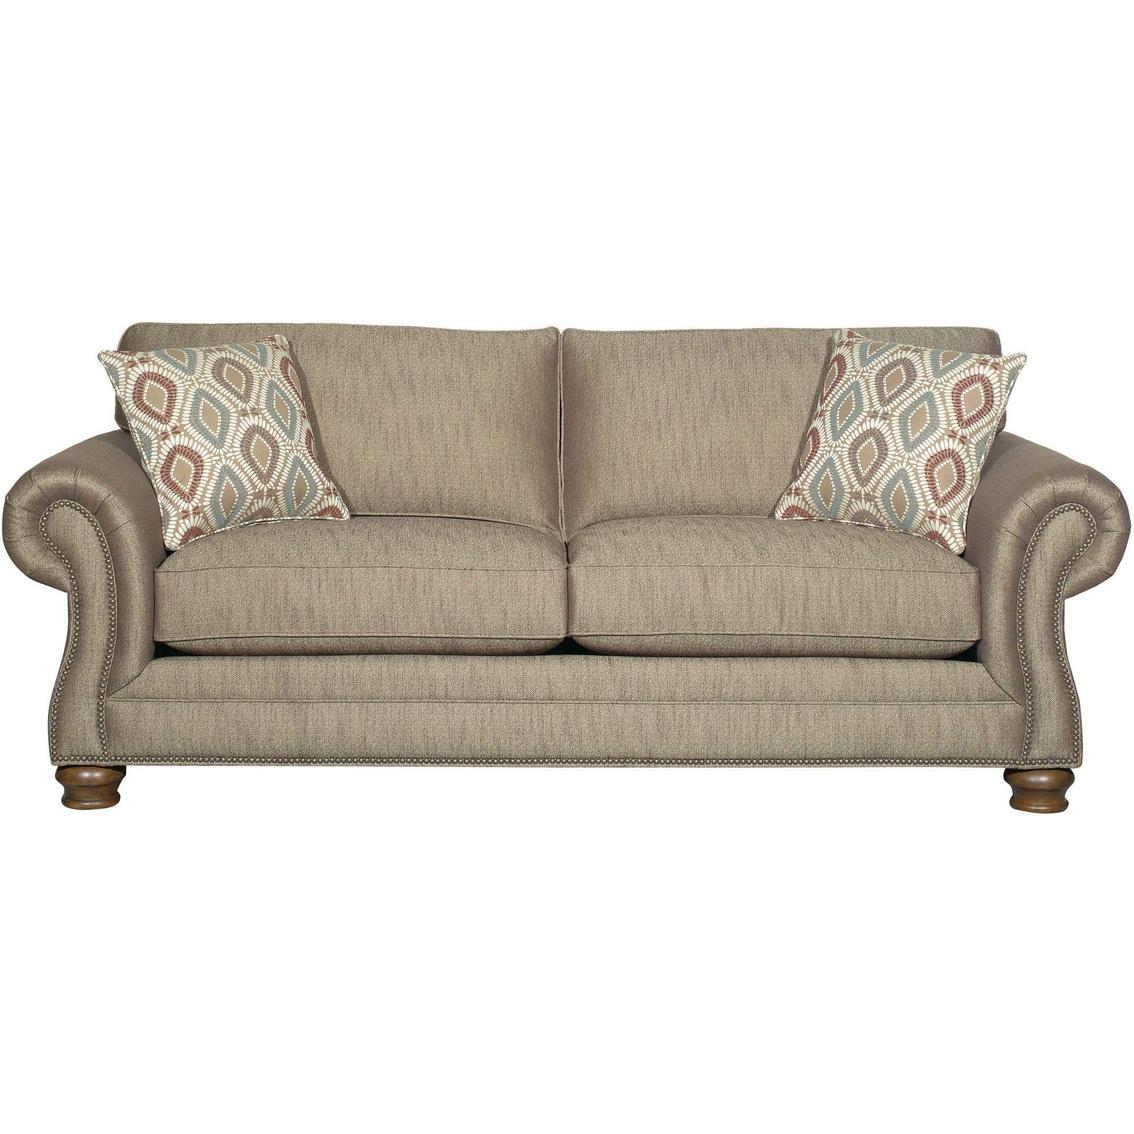 bassett couches and sofas custom designed sofa bassett. Black Bedroom Furniture Sets. Home Design Ideas